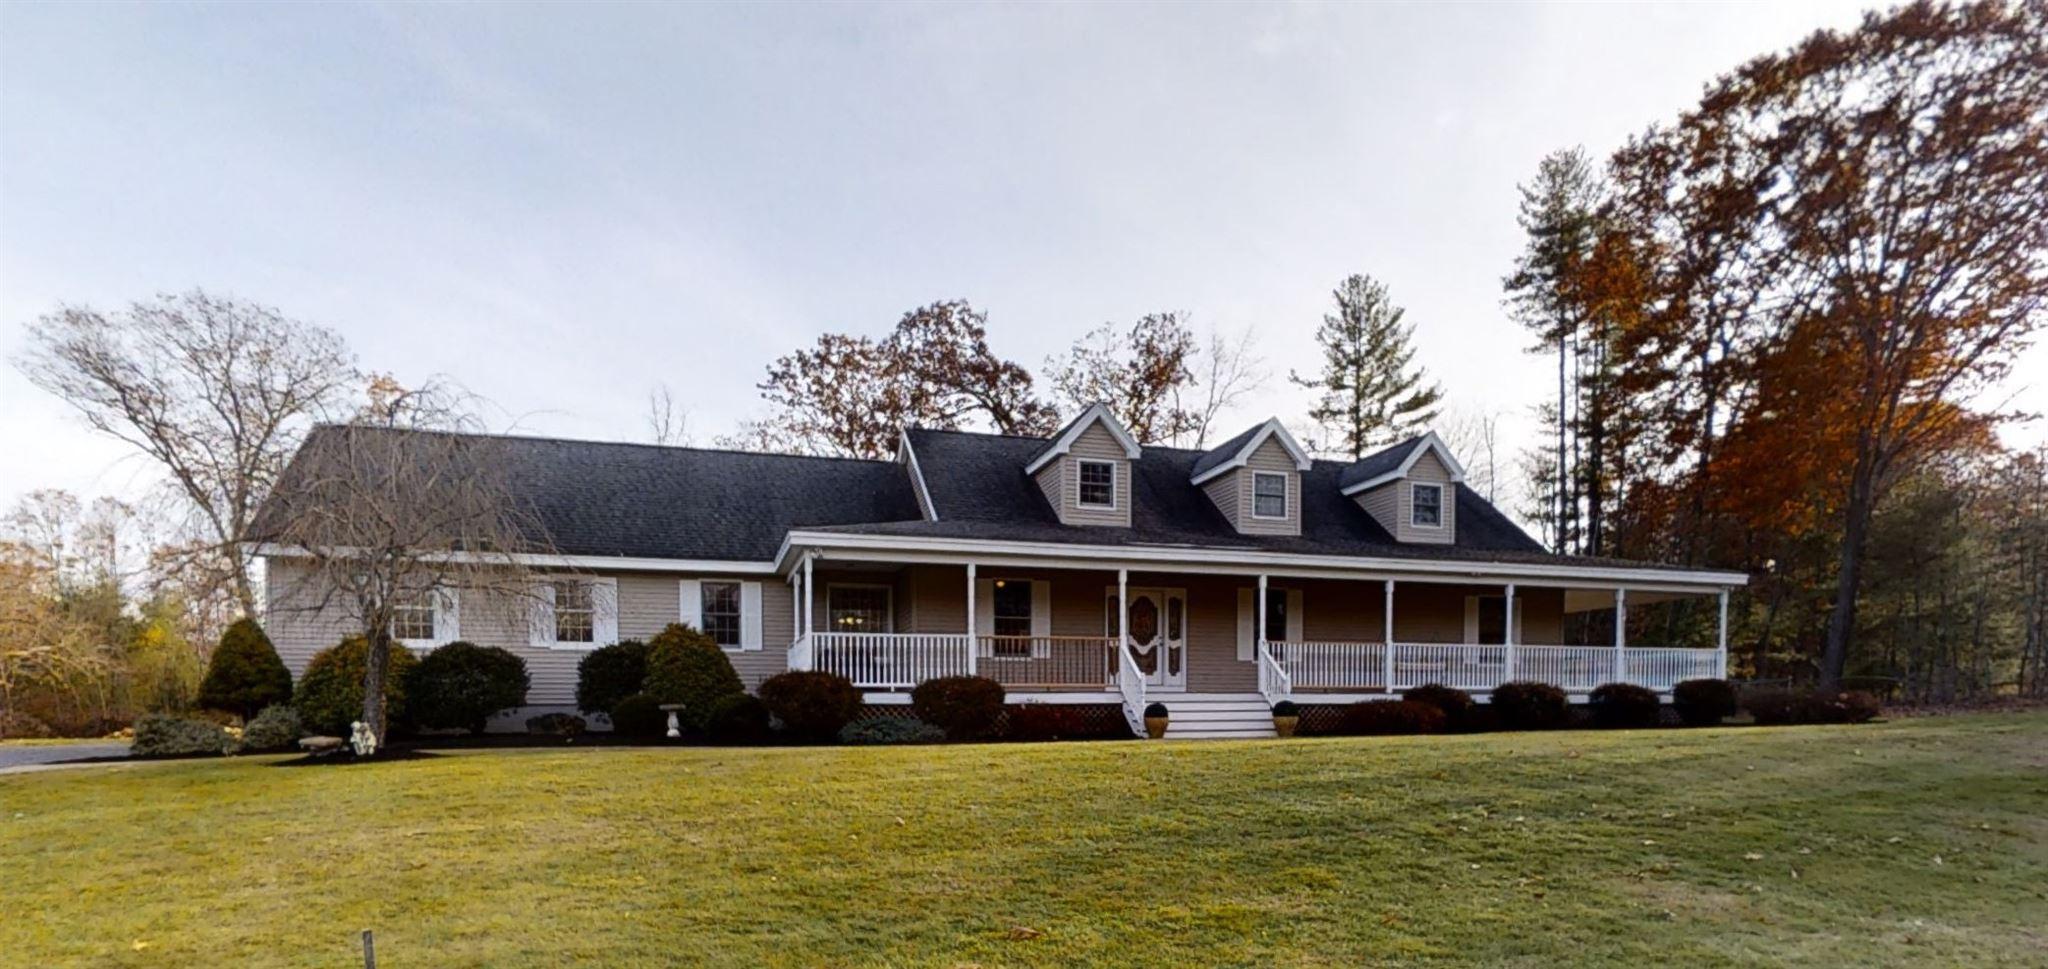 Photo of 9 Woodland Drive Plaistow NH 03865